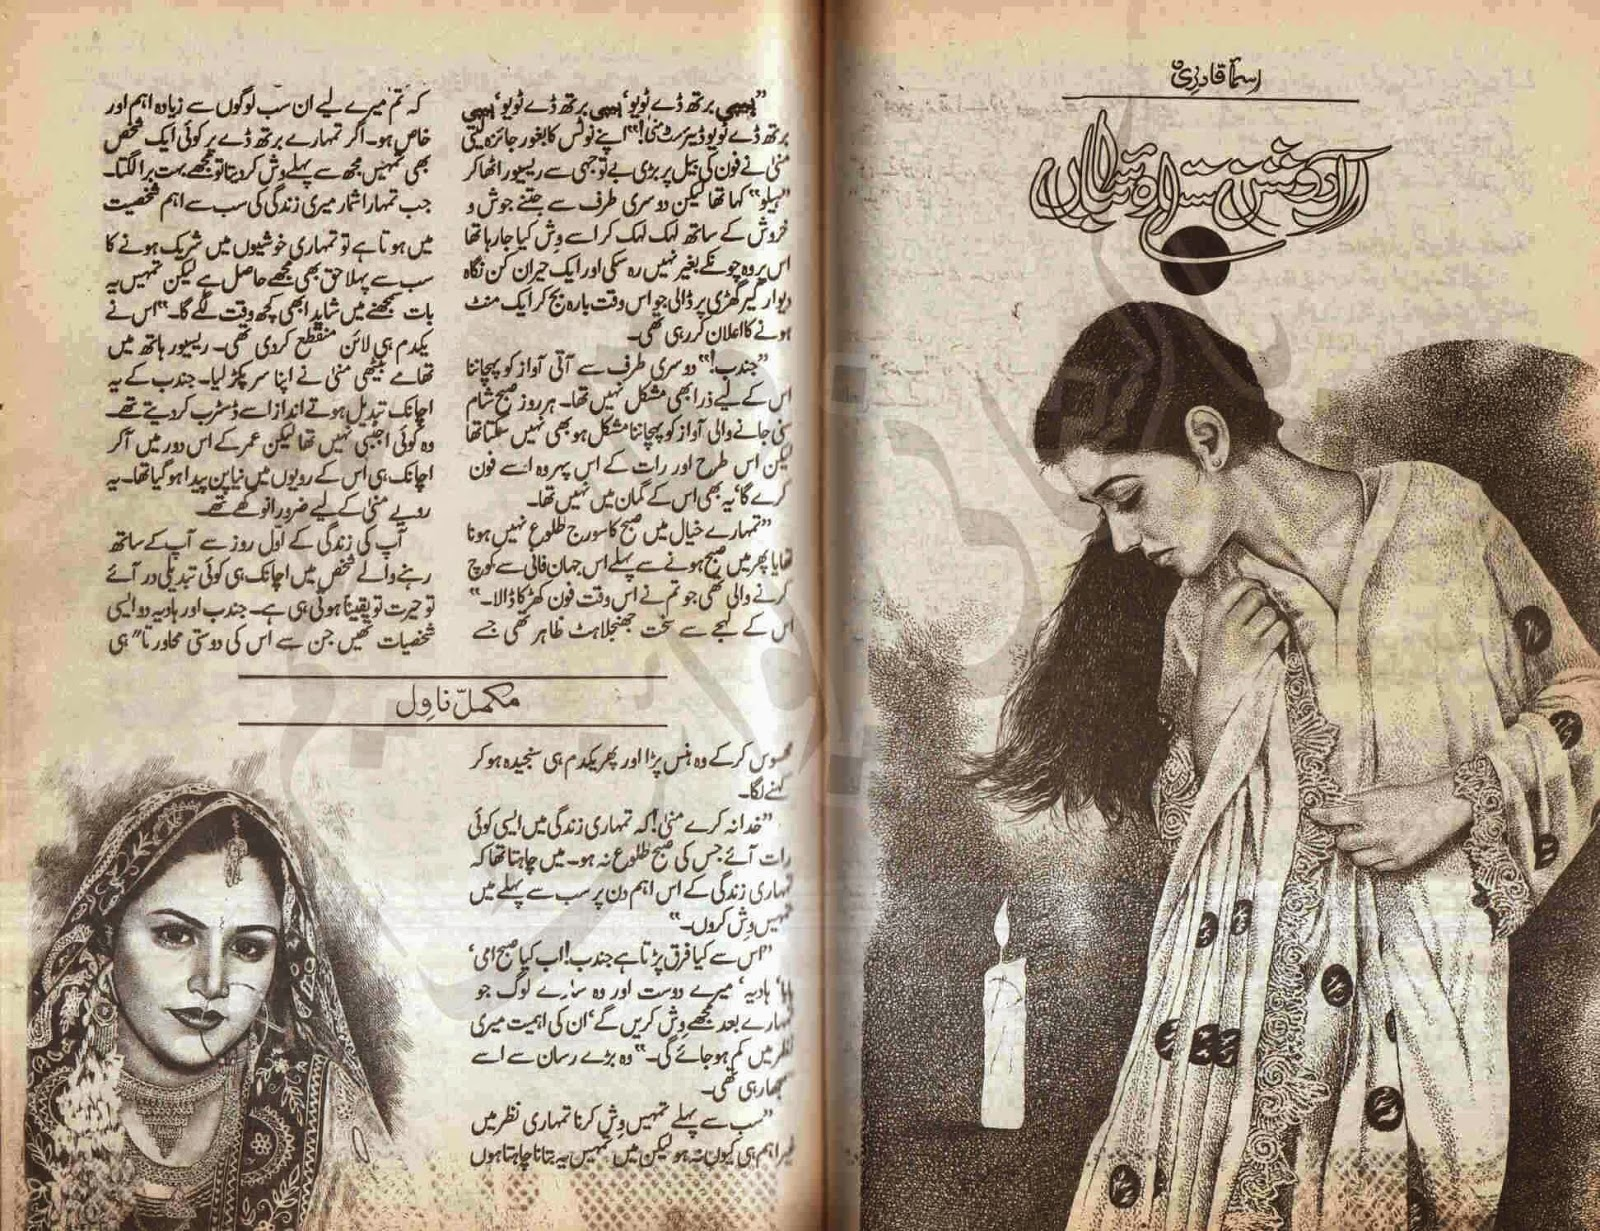 kitab dost ik roshan sitara e saiban by asma qadri online reading click on the more button to continue reading